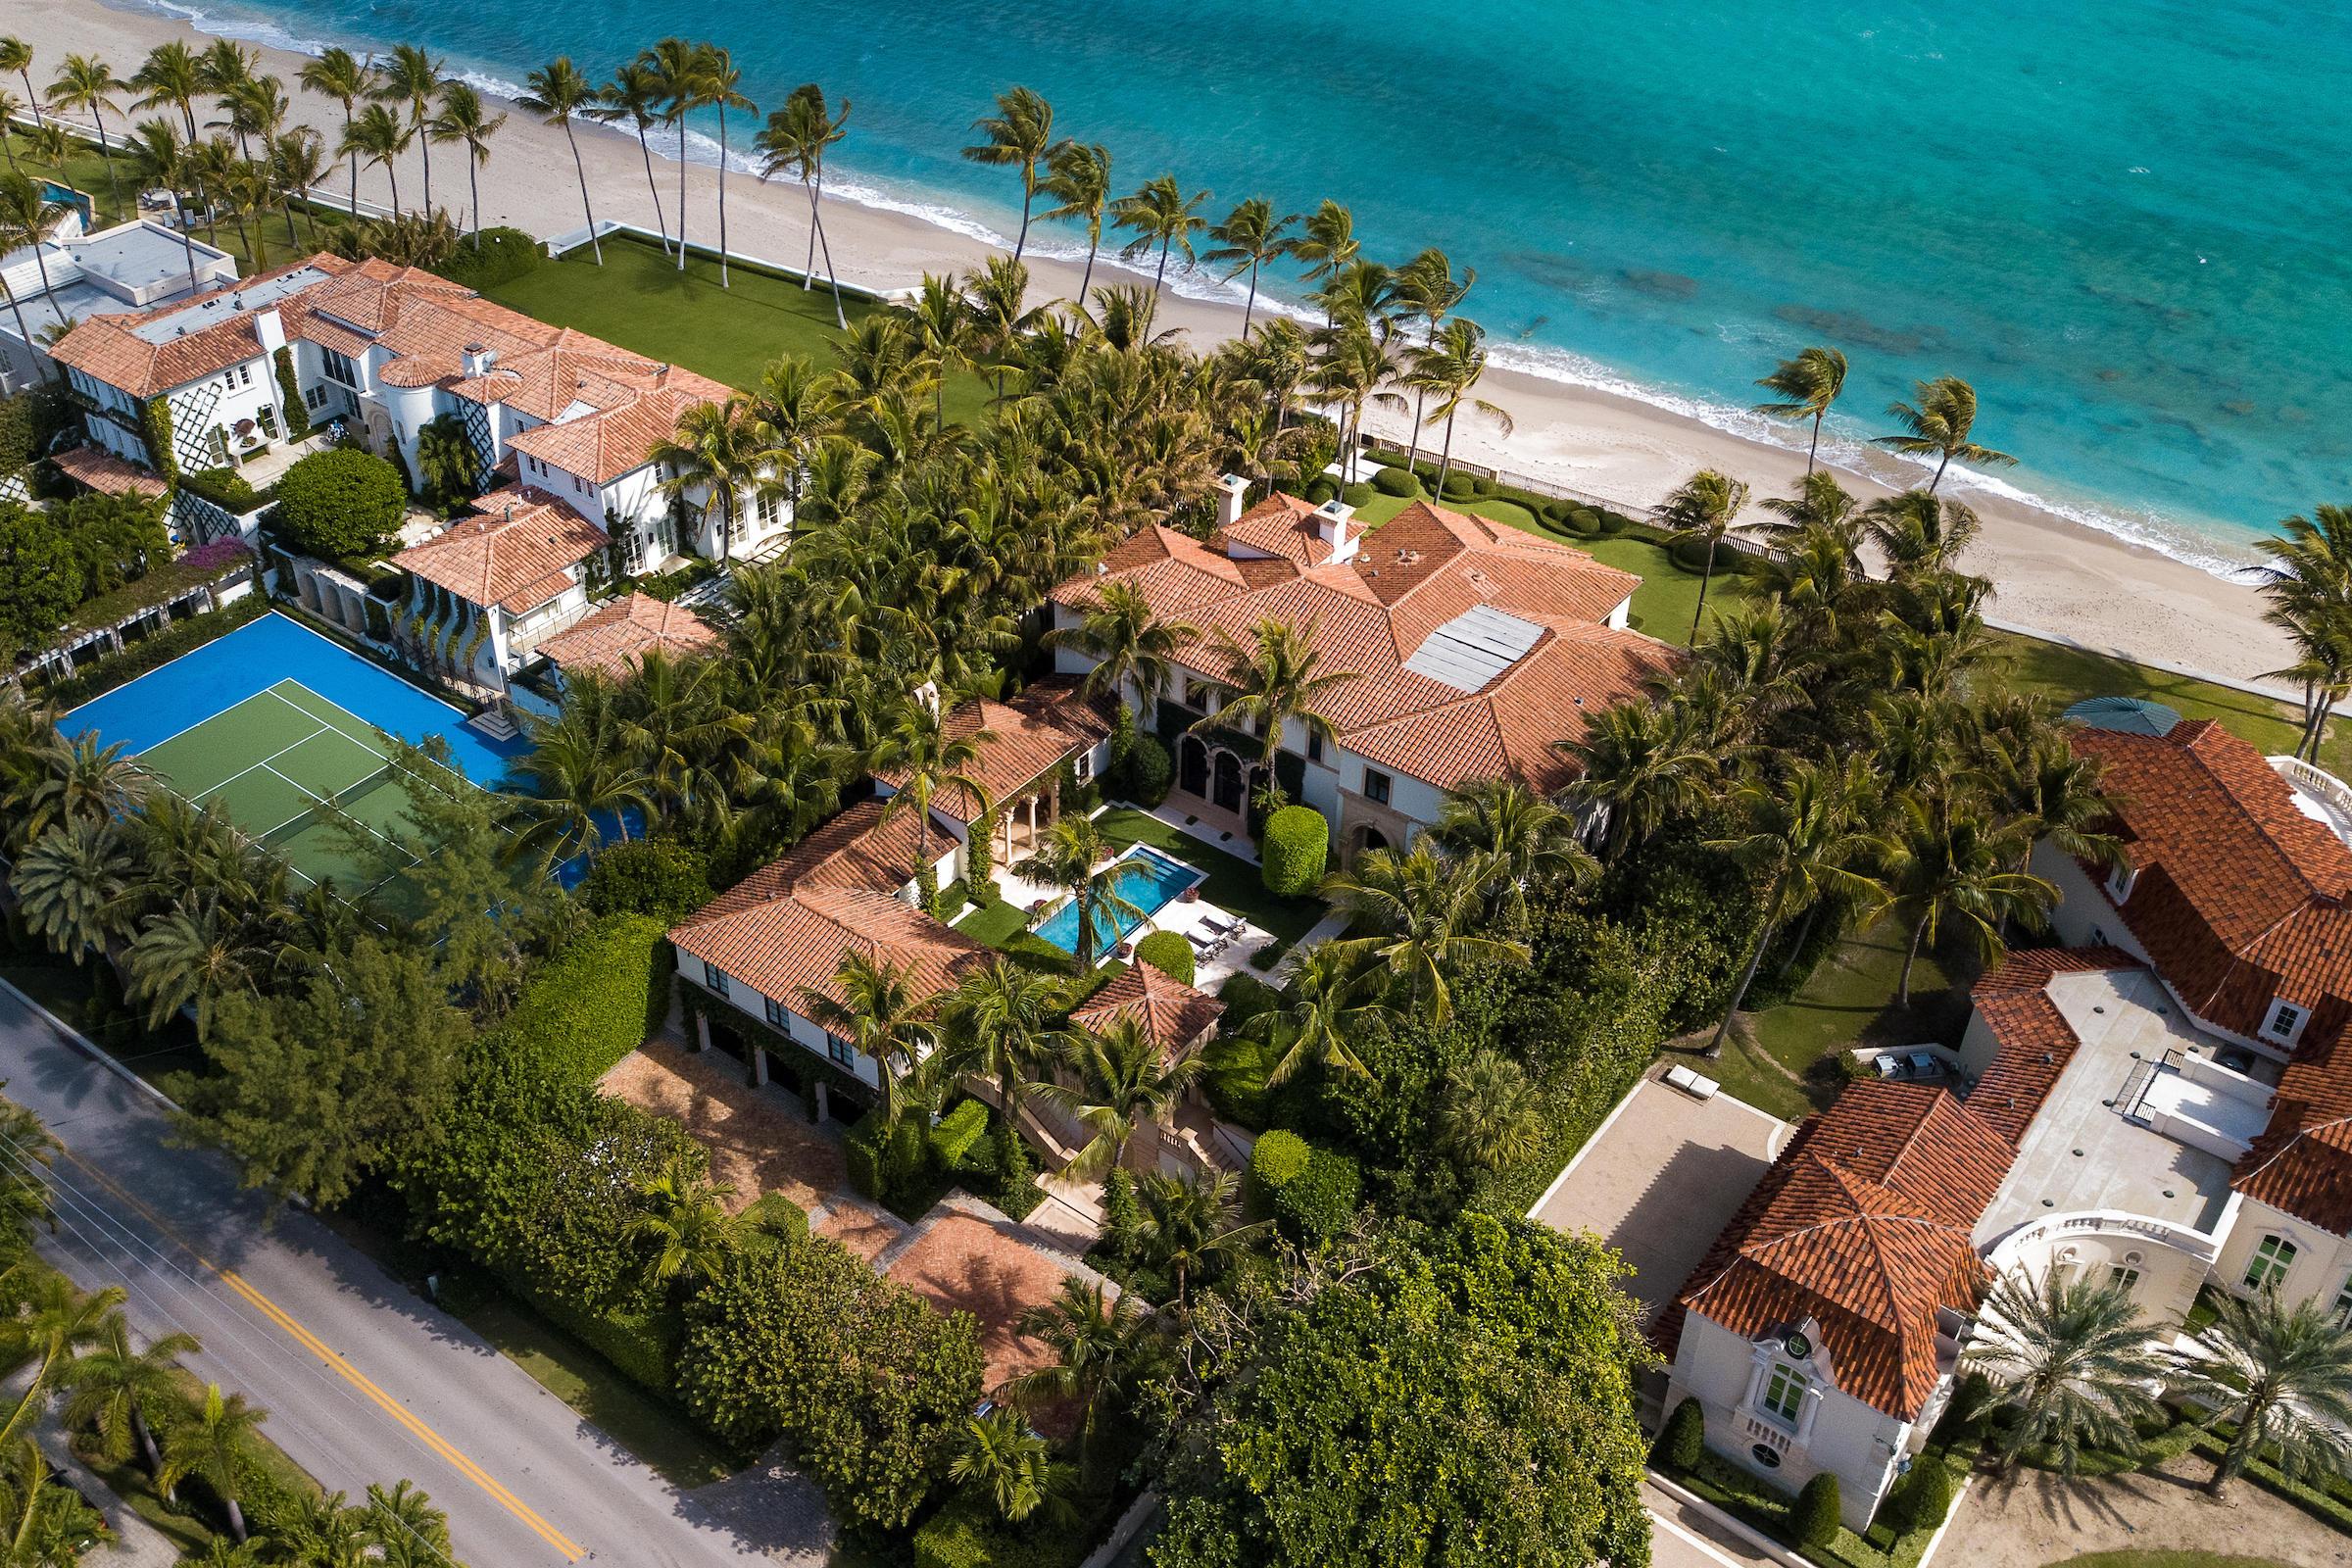 1075 N Ocean Boulevard, Palm Beach, Florida 33480, 7 Bedrooms Bedrooms, ,7.5 BathroomsBathrooms,Single family detached,For sale,Ocean,RX-10597199